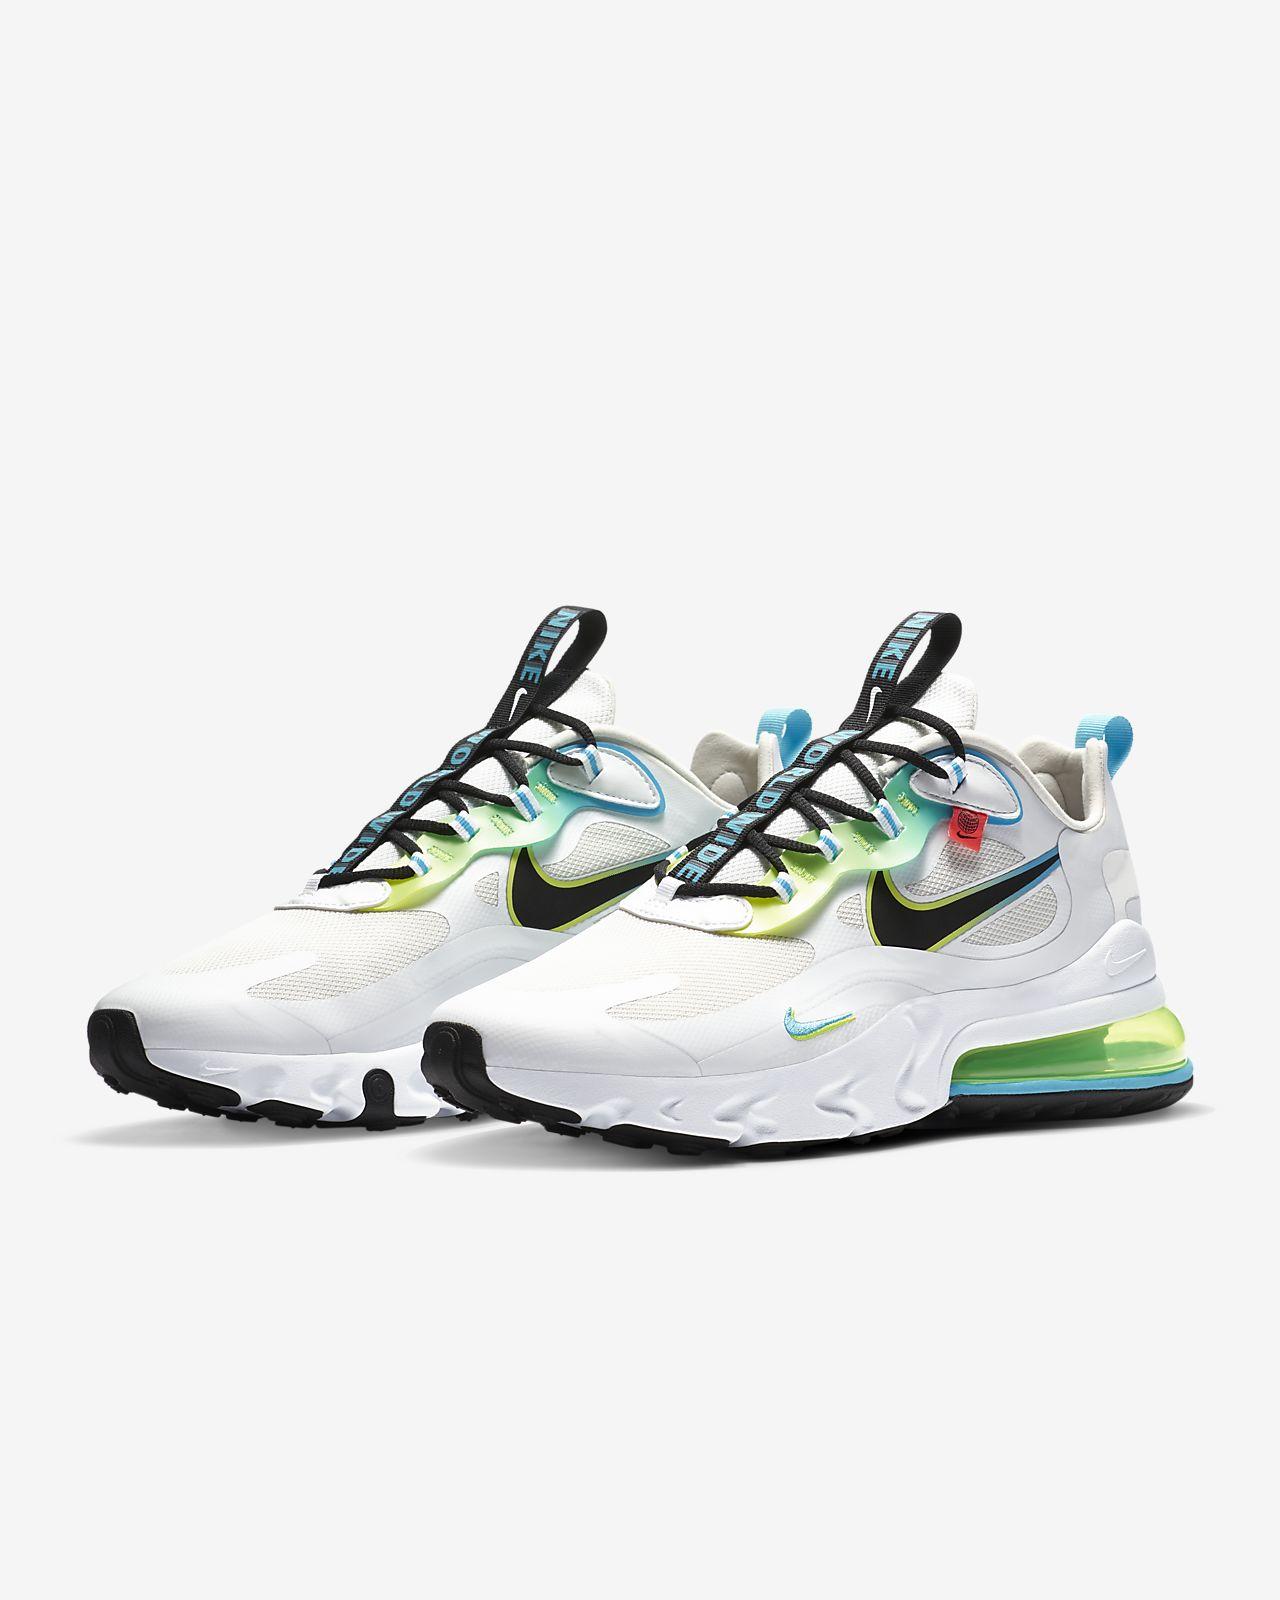 Nike Air Max 270 | Dame, herre, barn | Sportshowroom